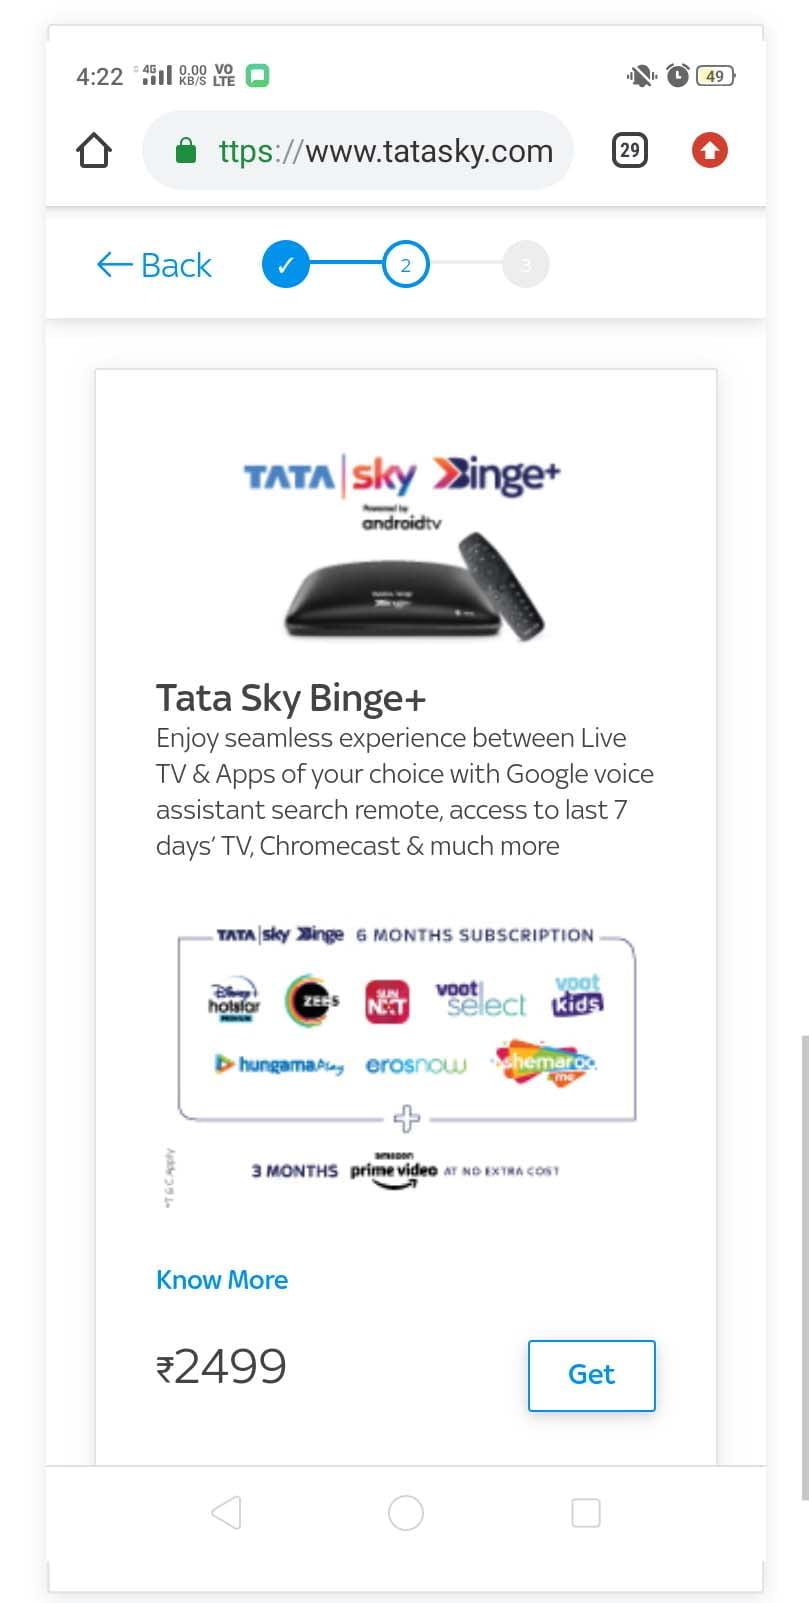 Tata Sky Binge Upgrade Rs 2499